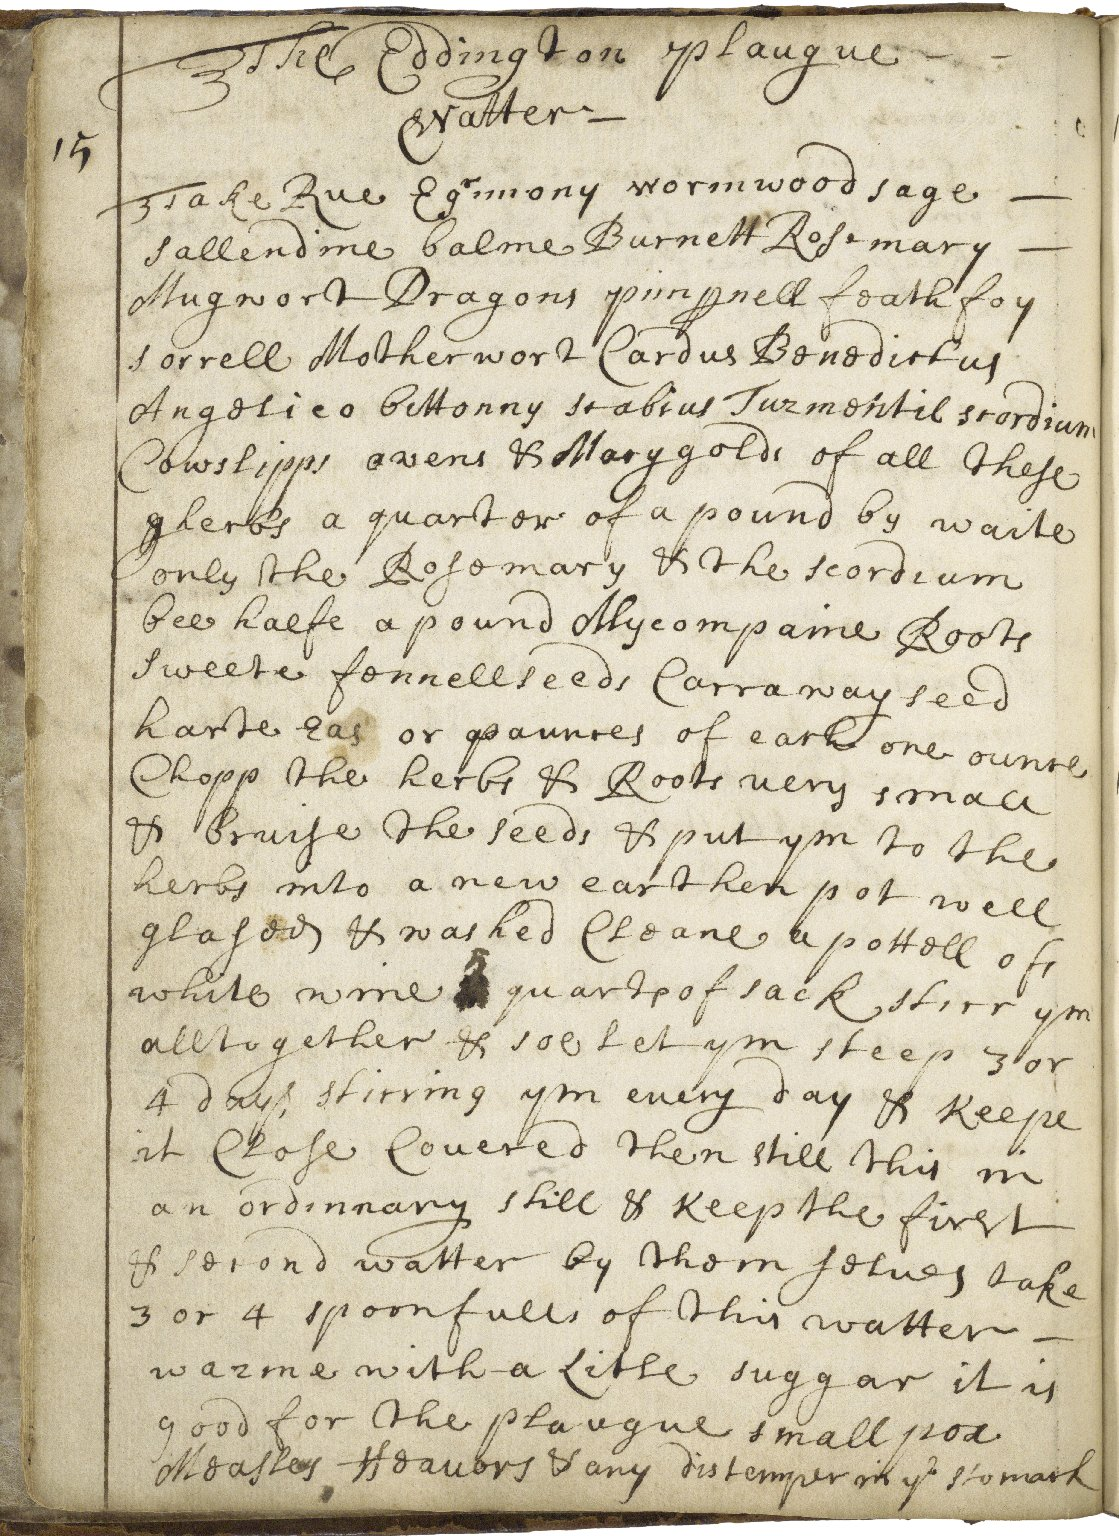 Receipt book of Penelope Jephson [manuscript], 1671, 1674/5.